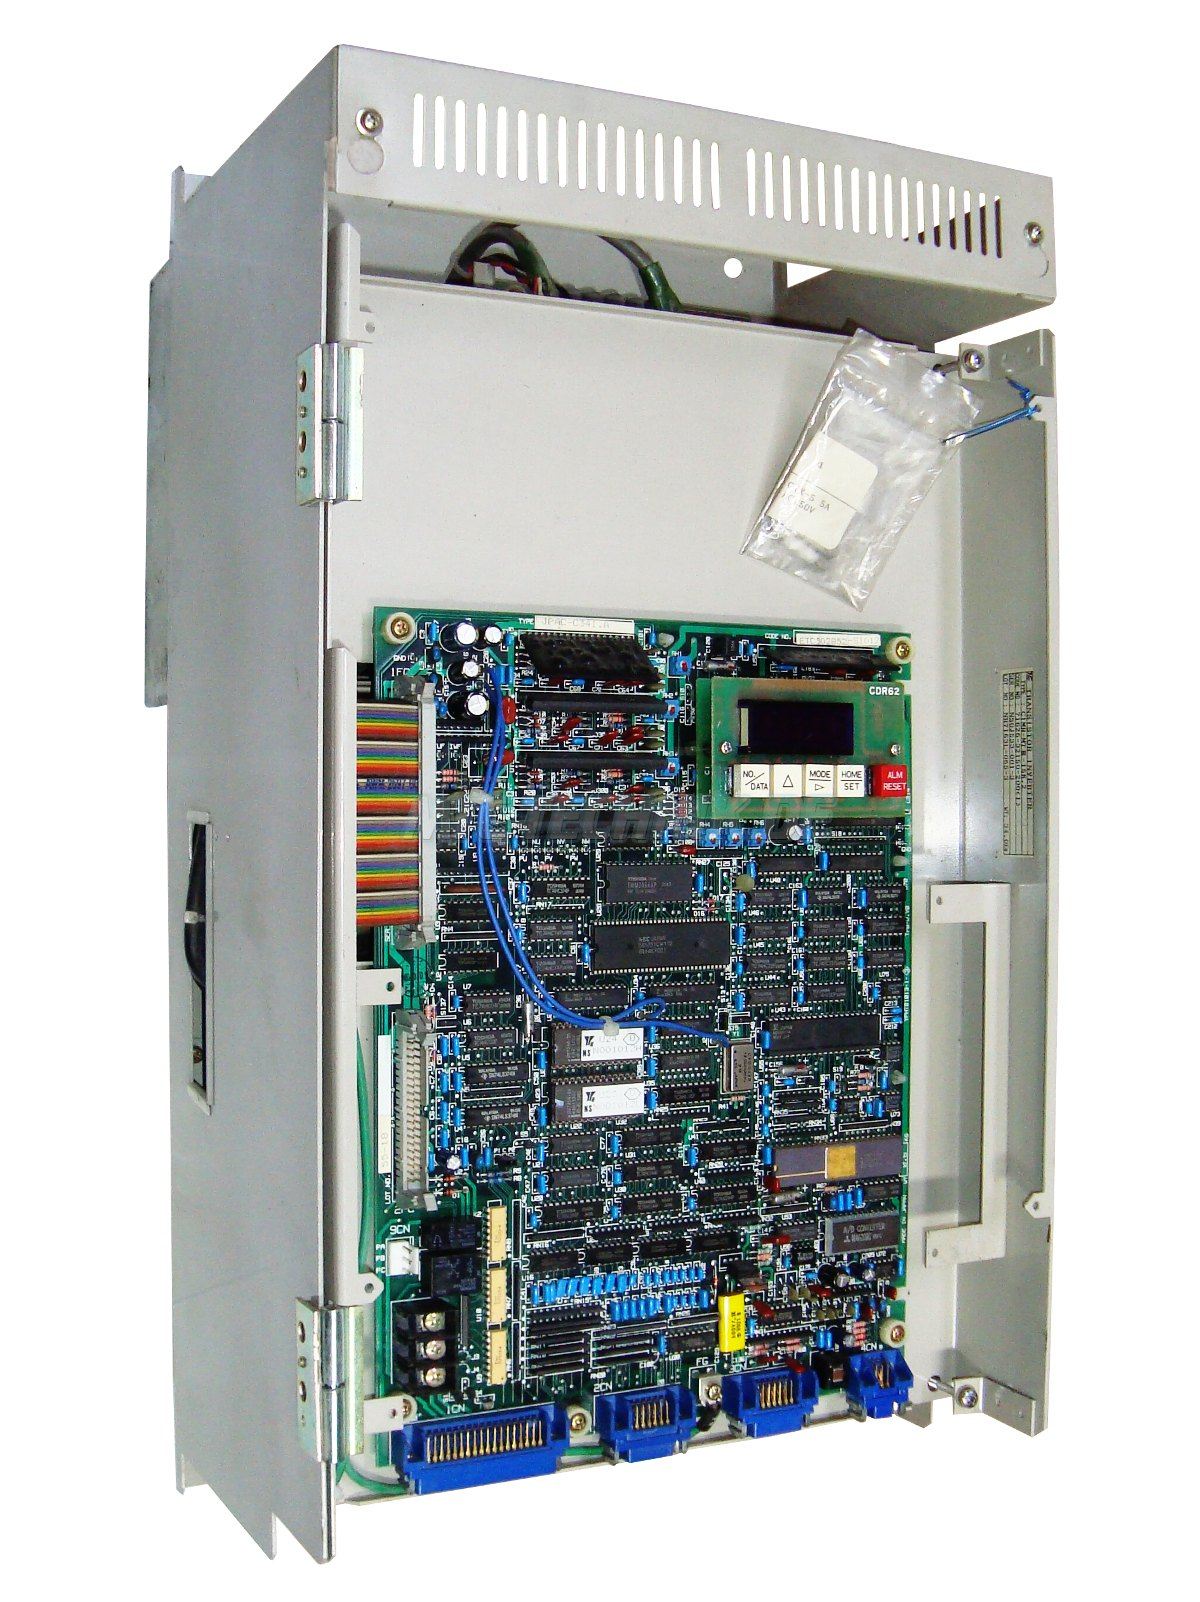 1 Yaskawa Cimr-mtiii-15k Transistor Inverter Shop